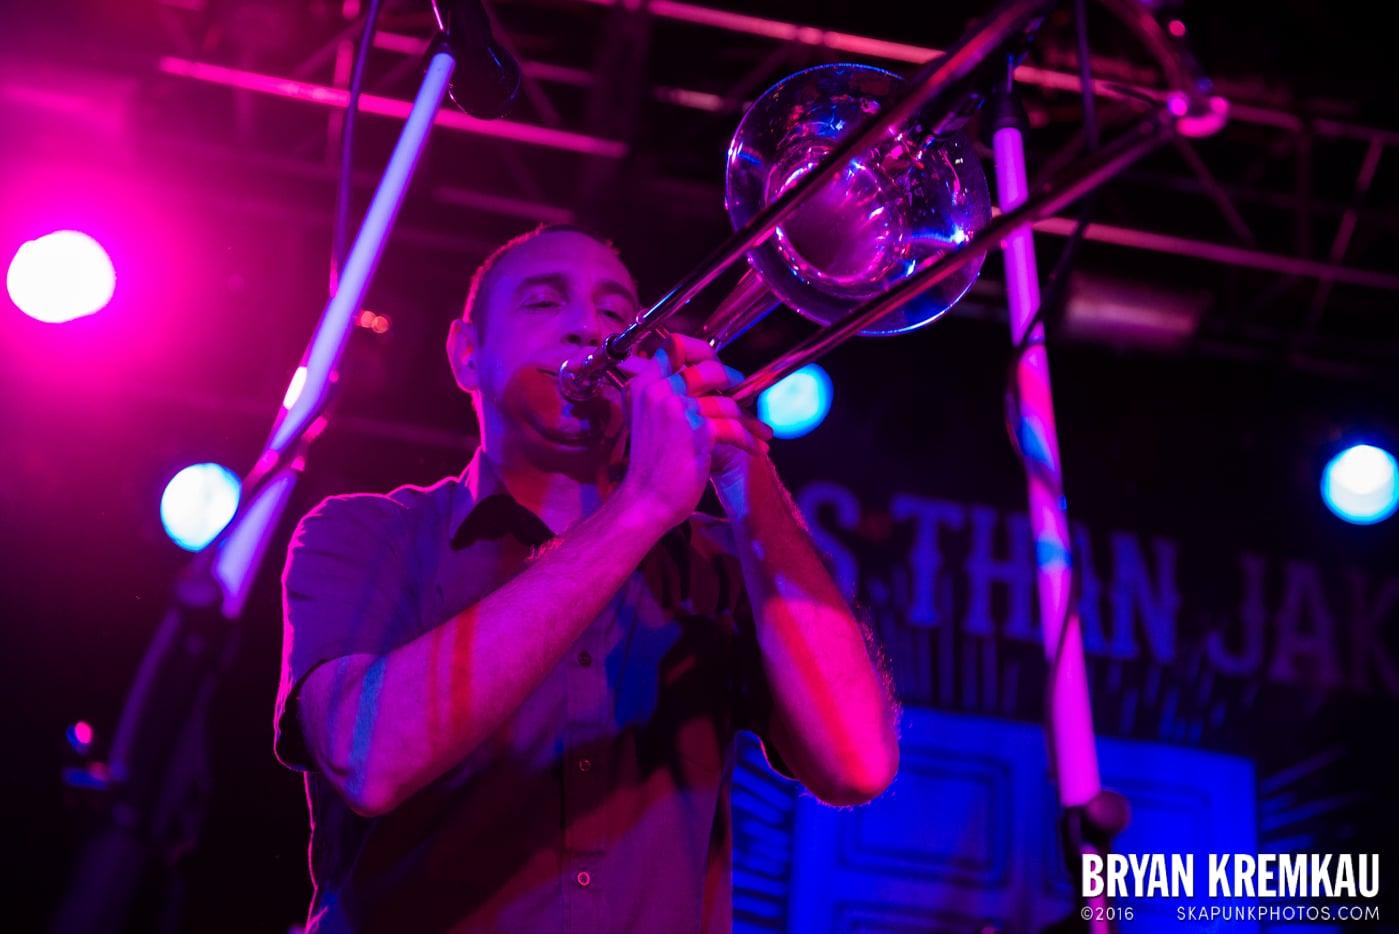 Less Than Jake @ Starland Ballroom, Sayreville, NJ - 11.9.13 (16)